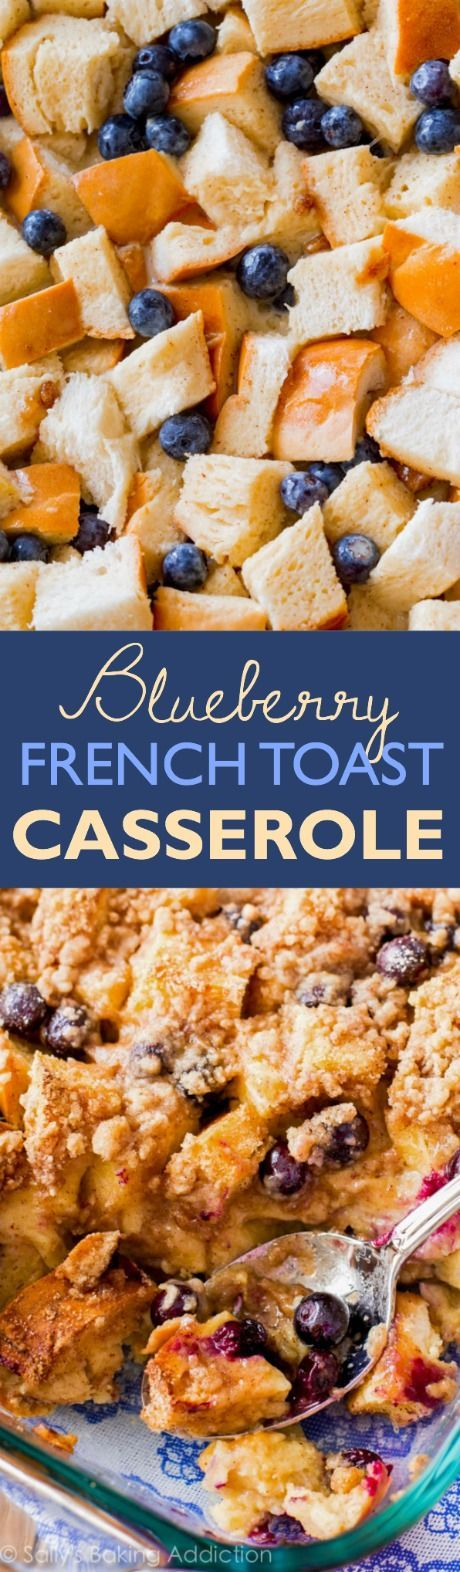 Overnight Blueberry French Toast Casserole-- make ahead breakfast brunch recipe found on sallysbakingaddiction.com